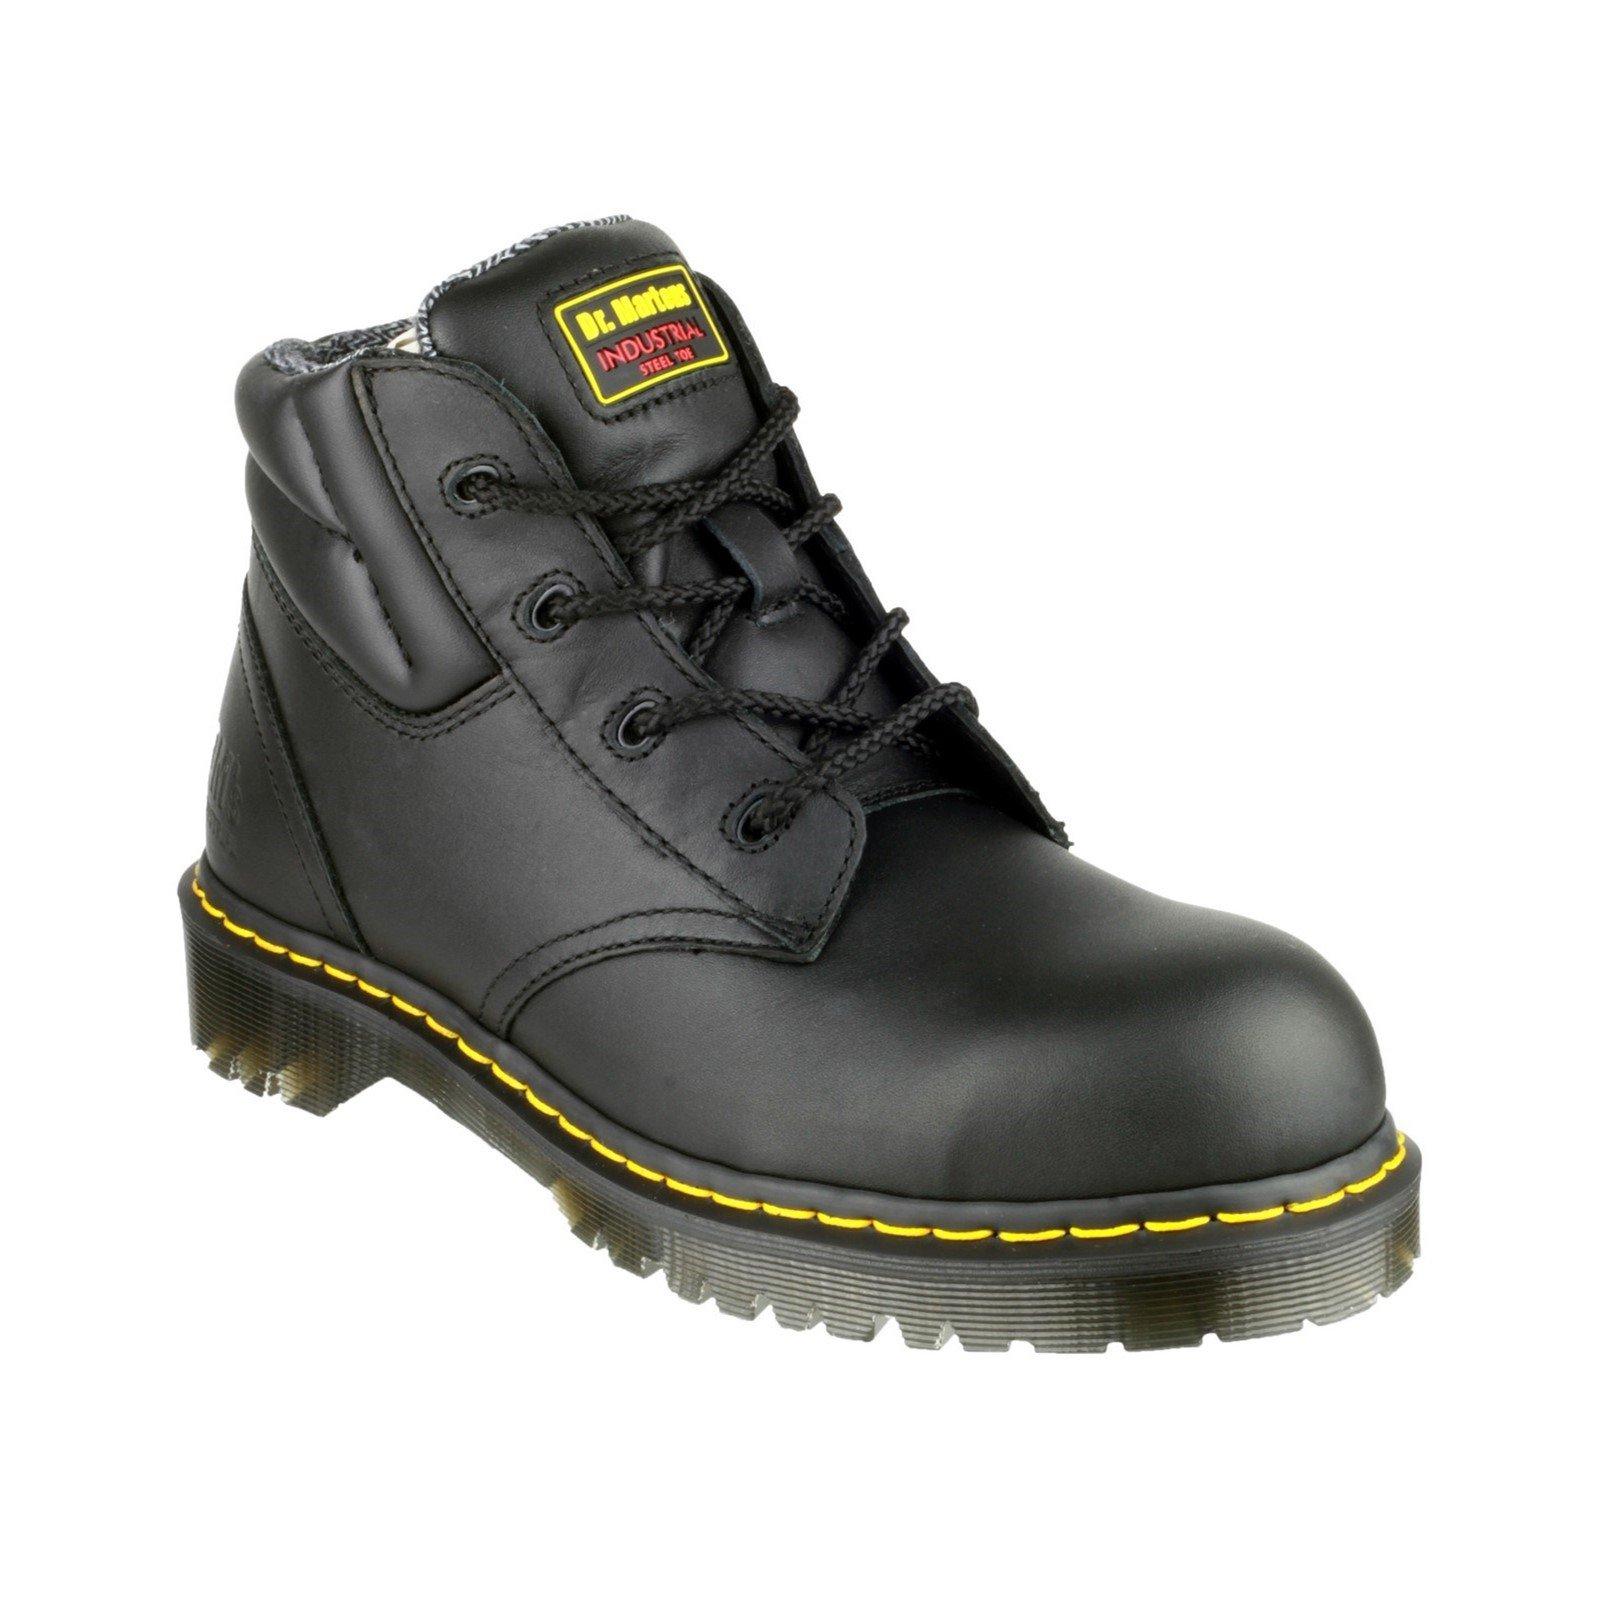 Dr Martens Unisex Lace-Up Boot Black 14068 - Black 7